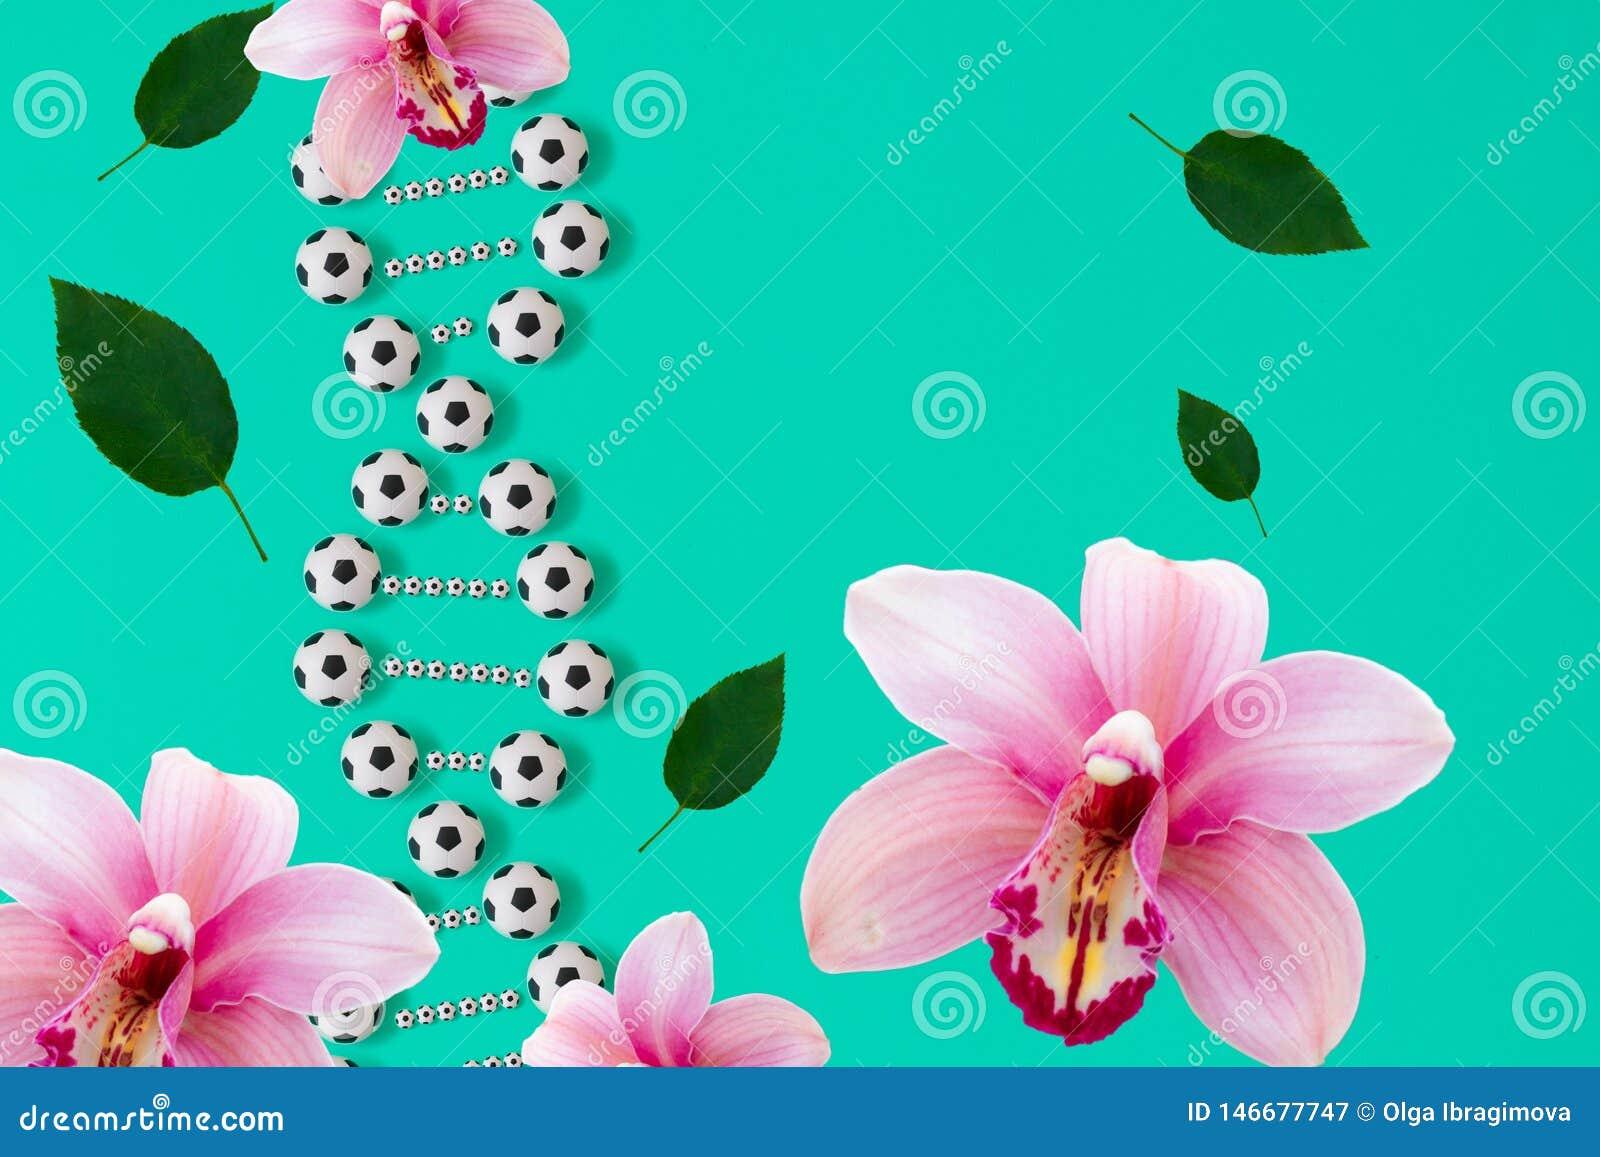 ADN du football sur le fond bleu